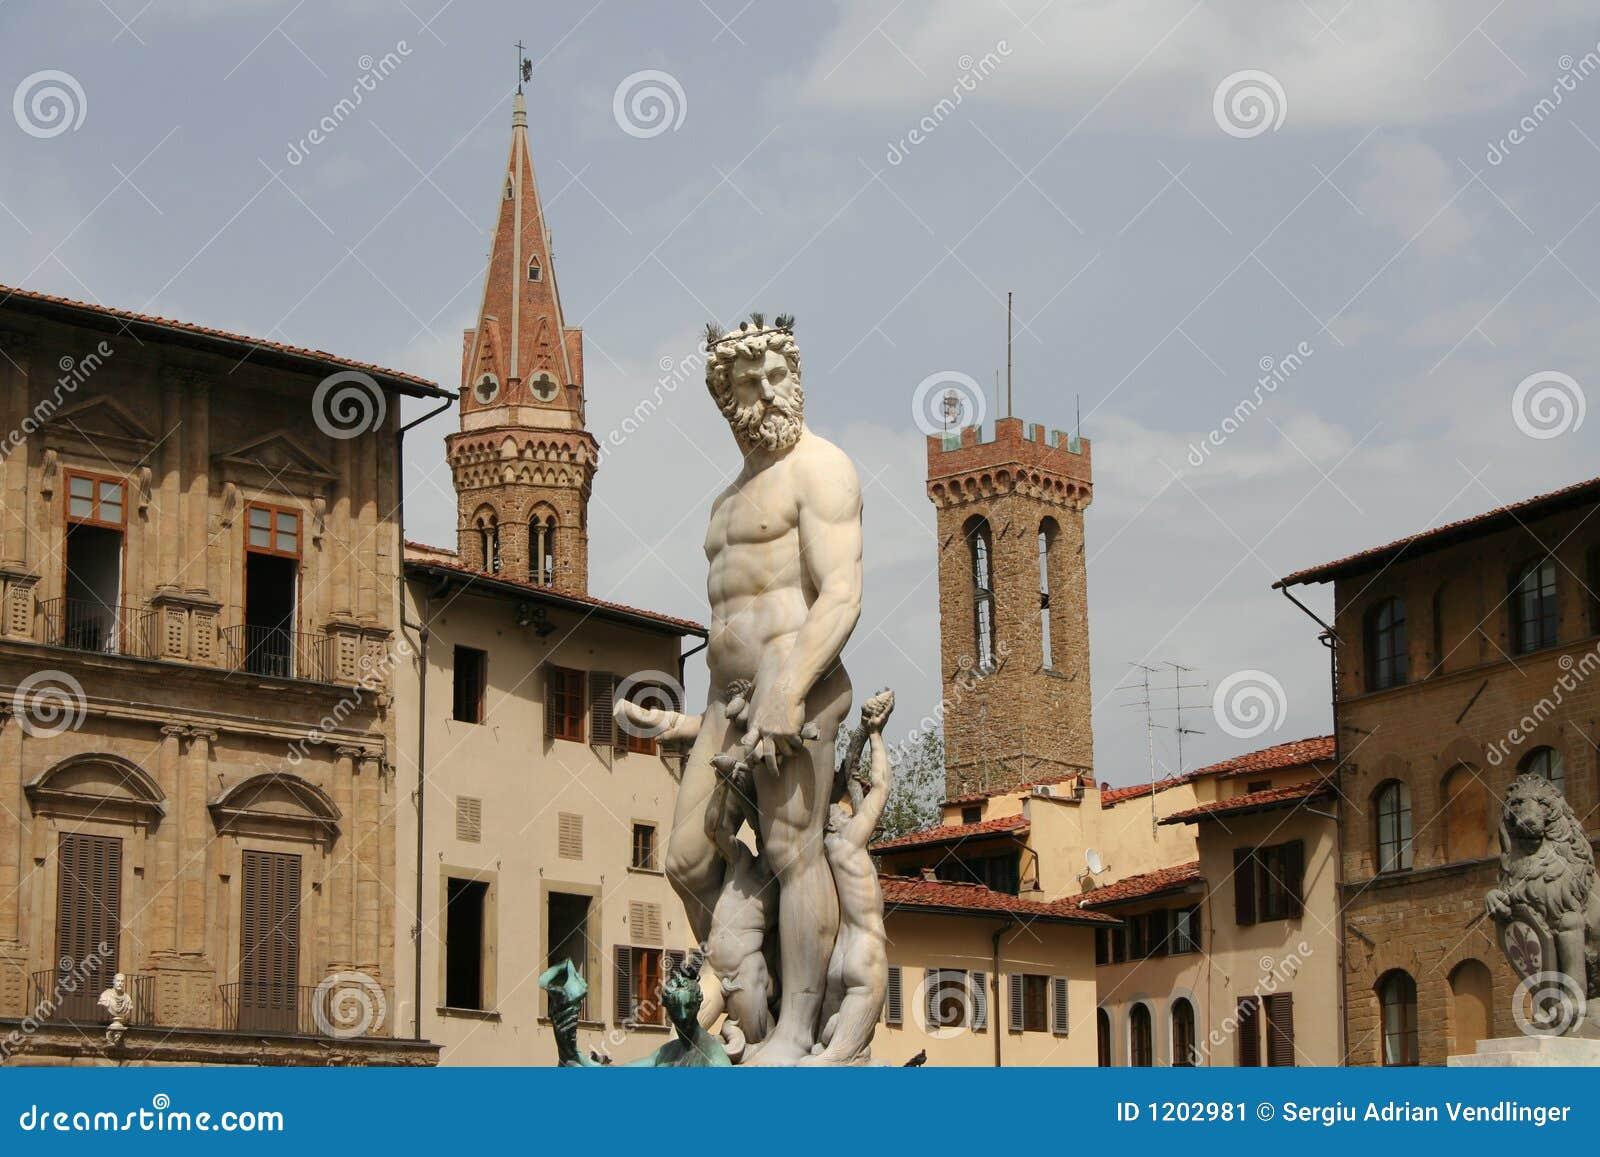 Firenze, Poseidon